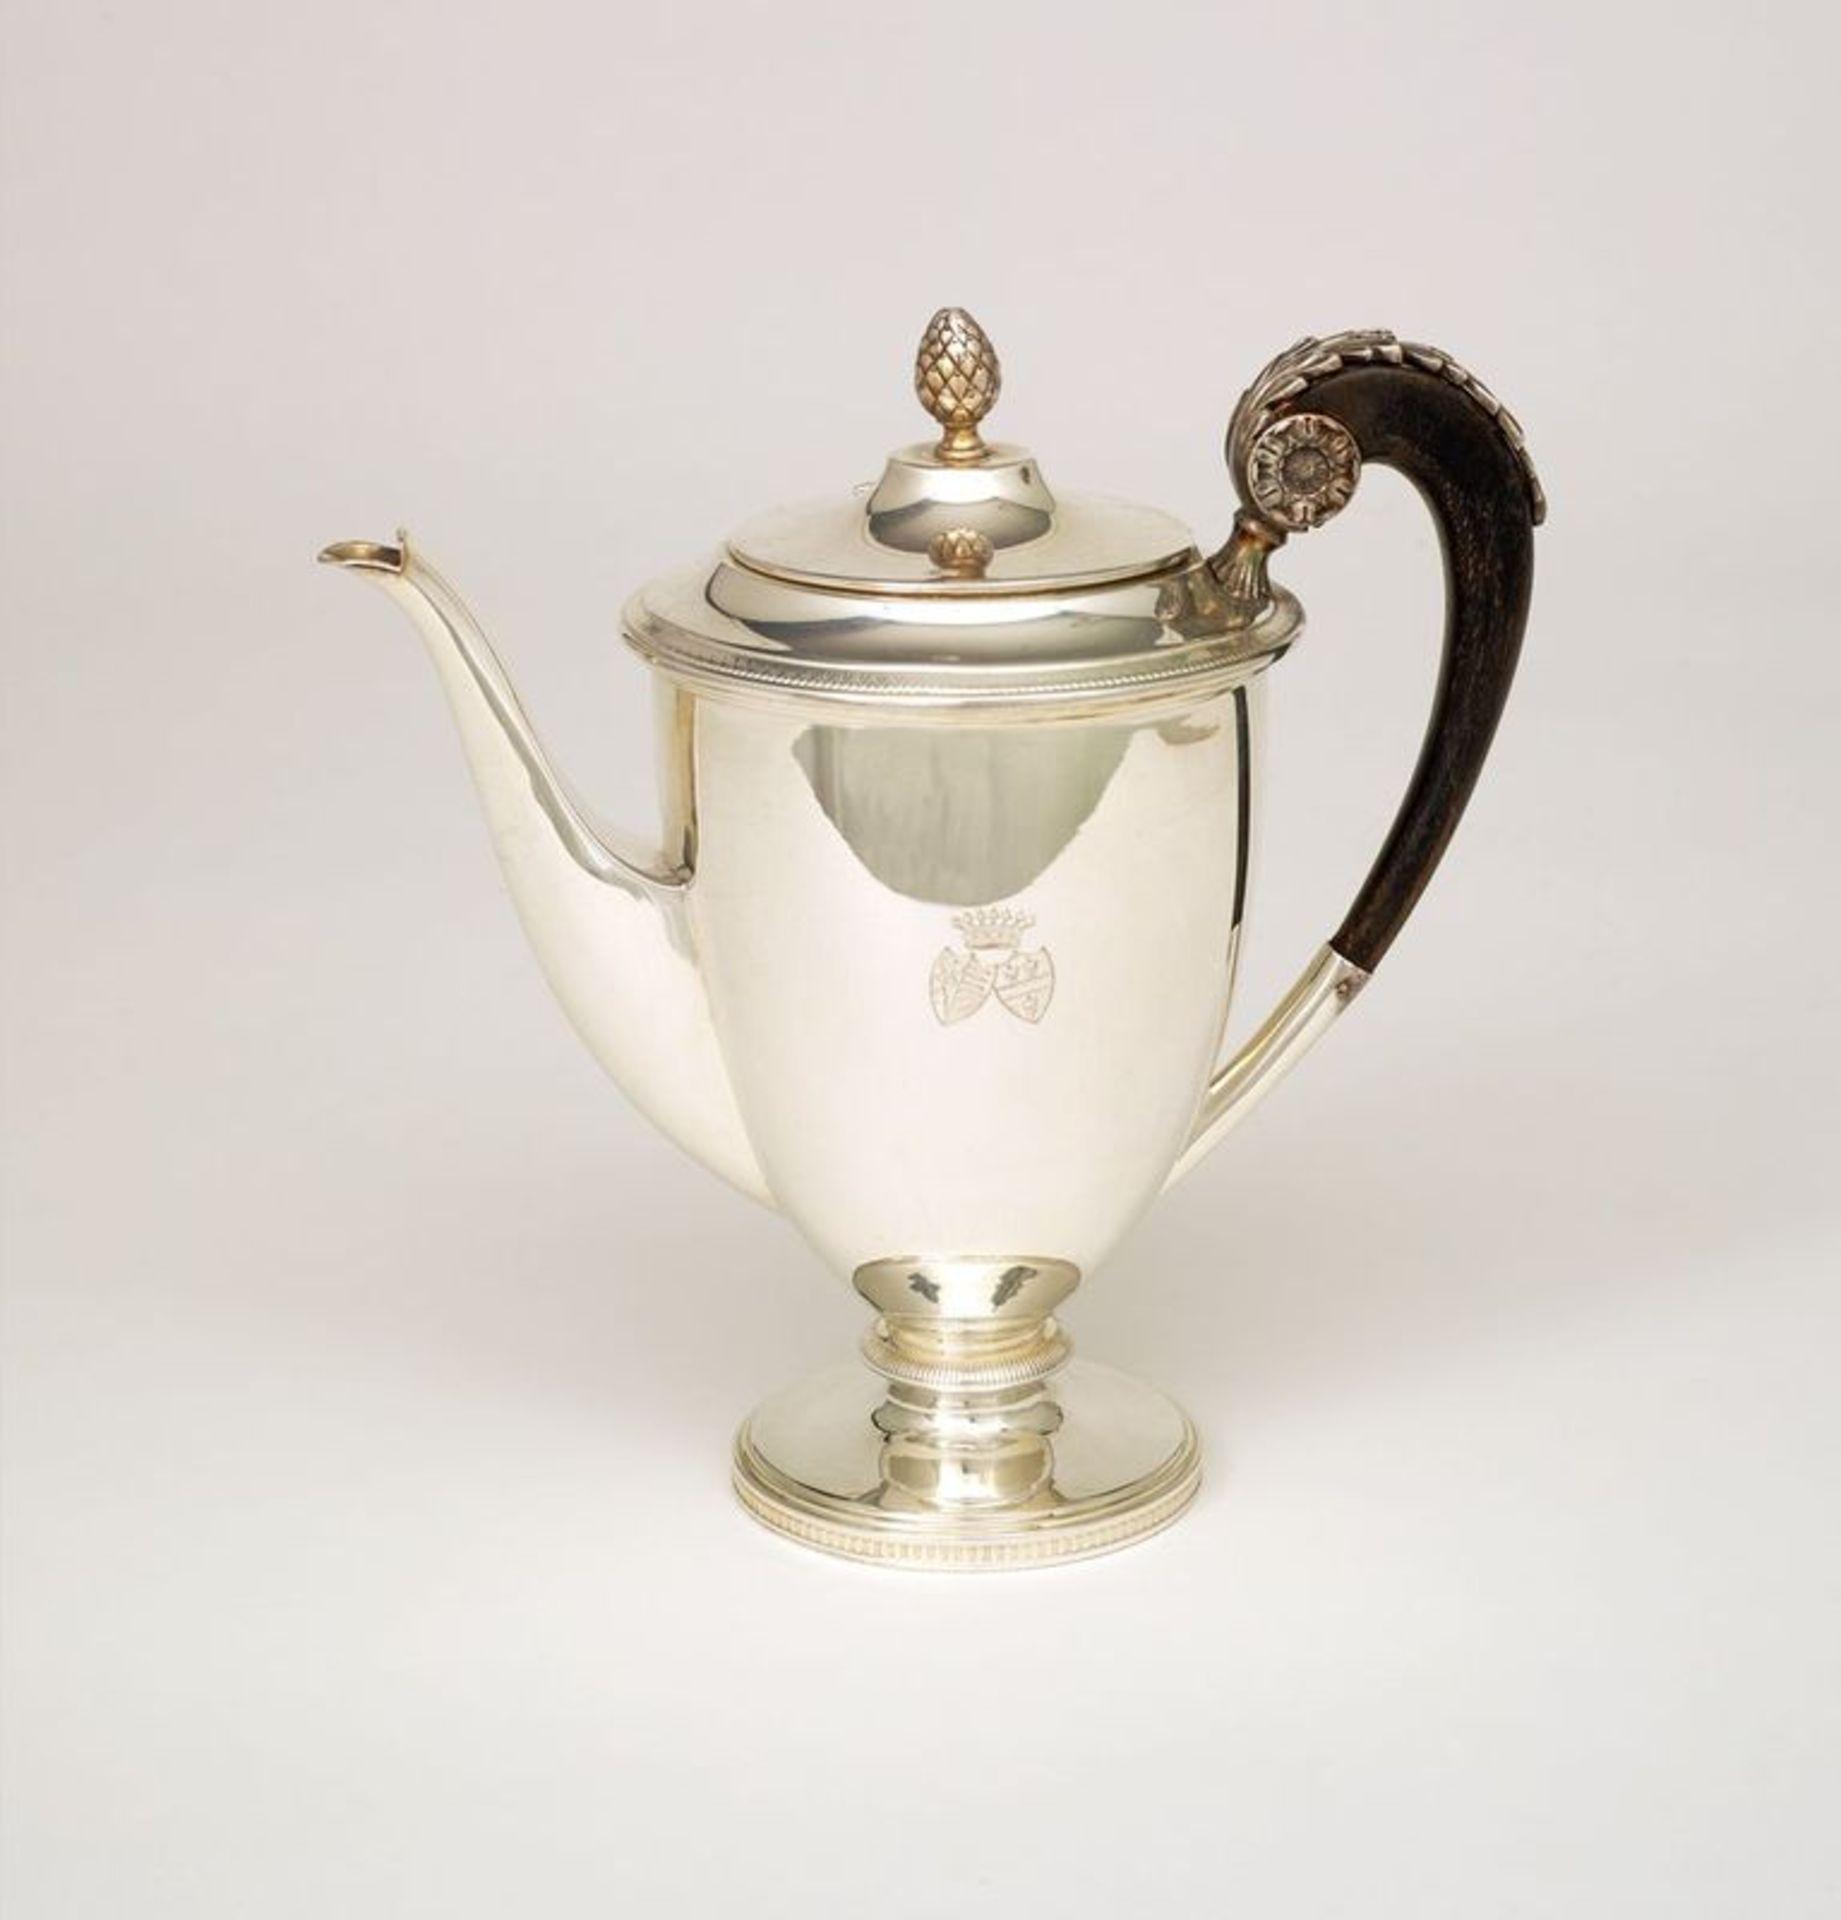 SILVER TEA AND COFFEE SERVICE SET FROM VIENNA BY ALEXANDER STURM - Silver set, 7 [...] - Bild 4 aus 5